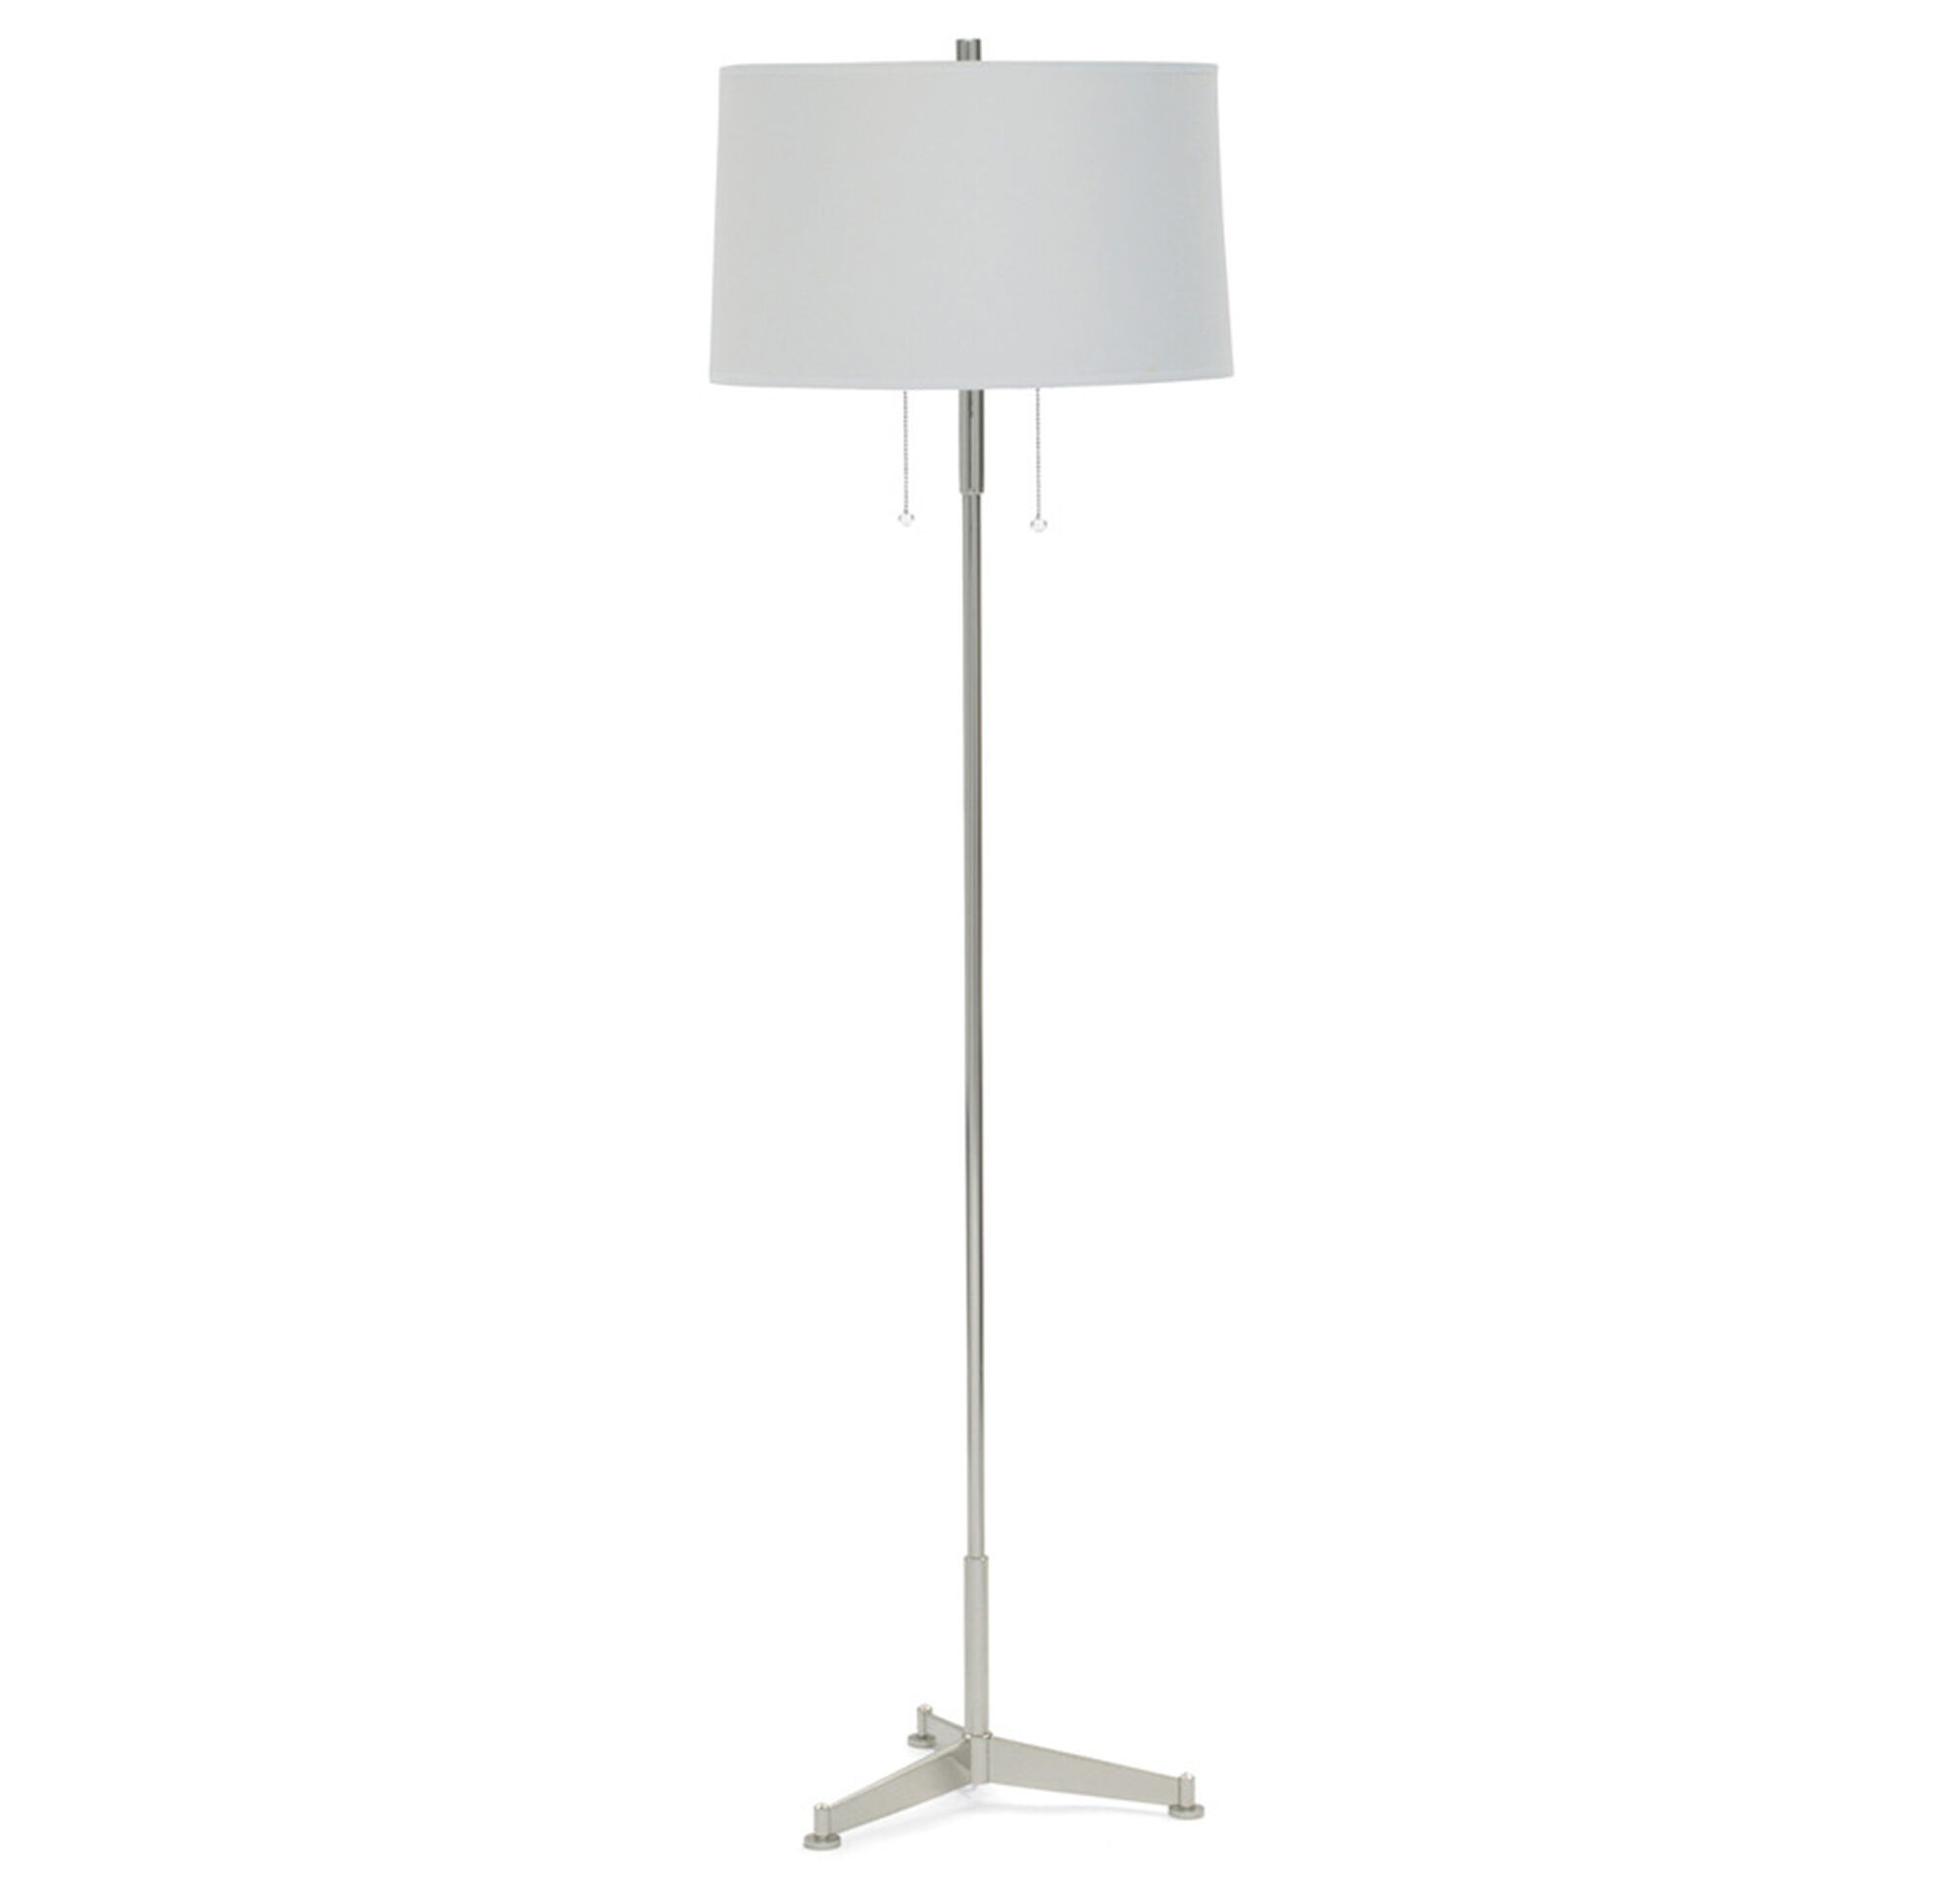 PIPER FLOOR LAMP - POLISHED NICKEL